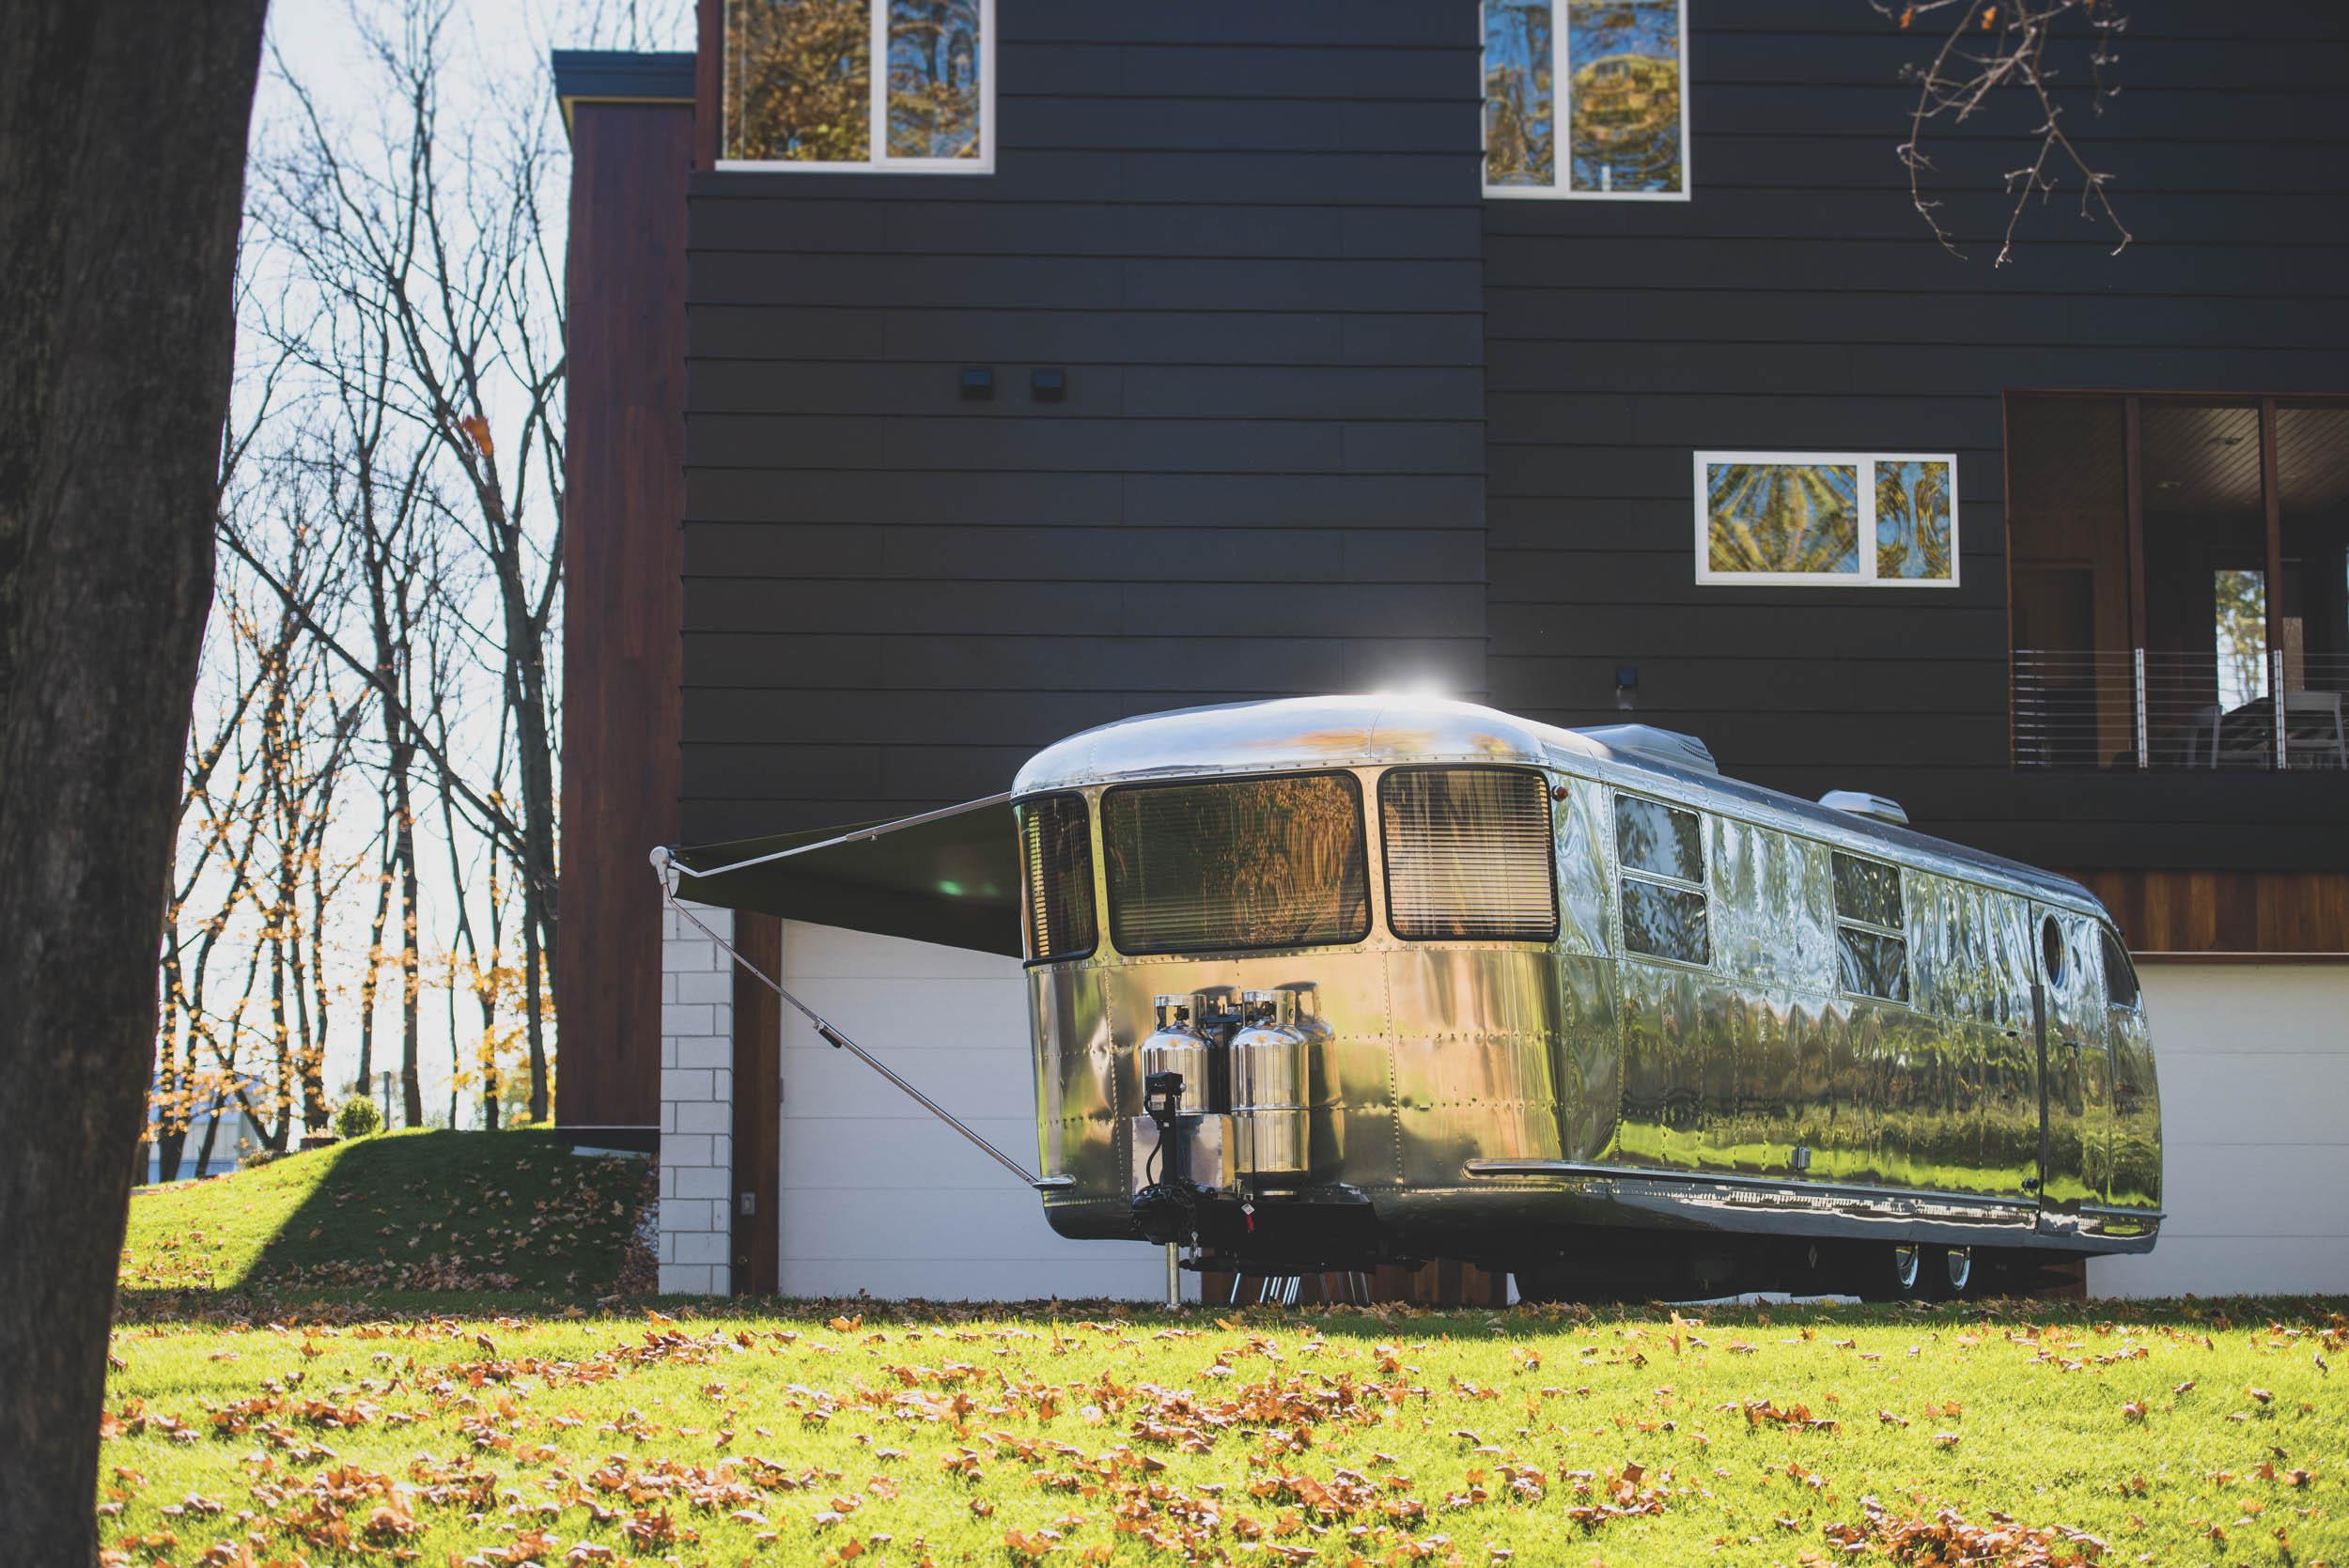 1951 Spartan Royal Mansion trailer